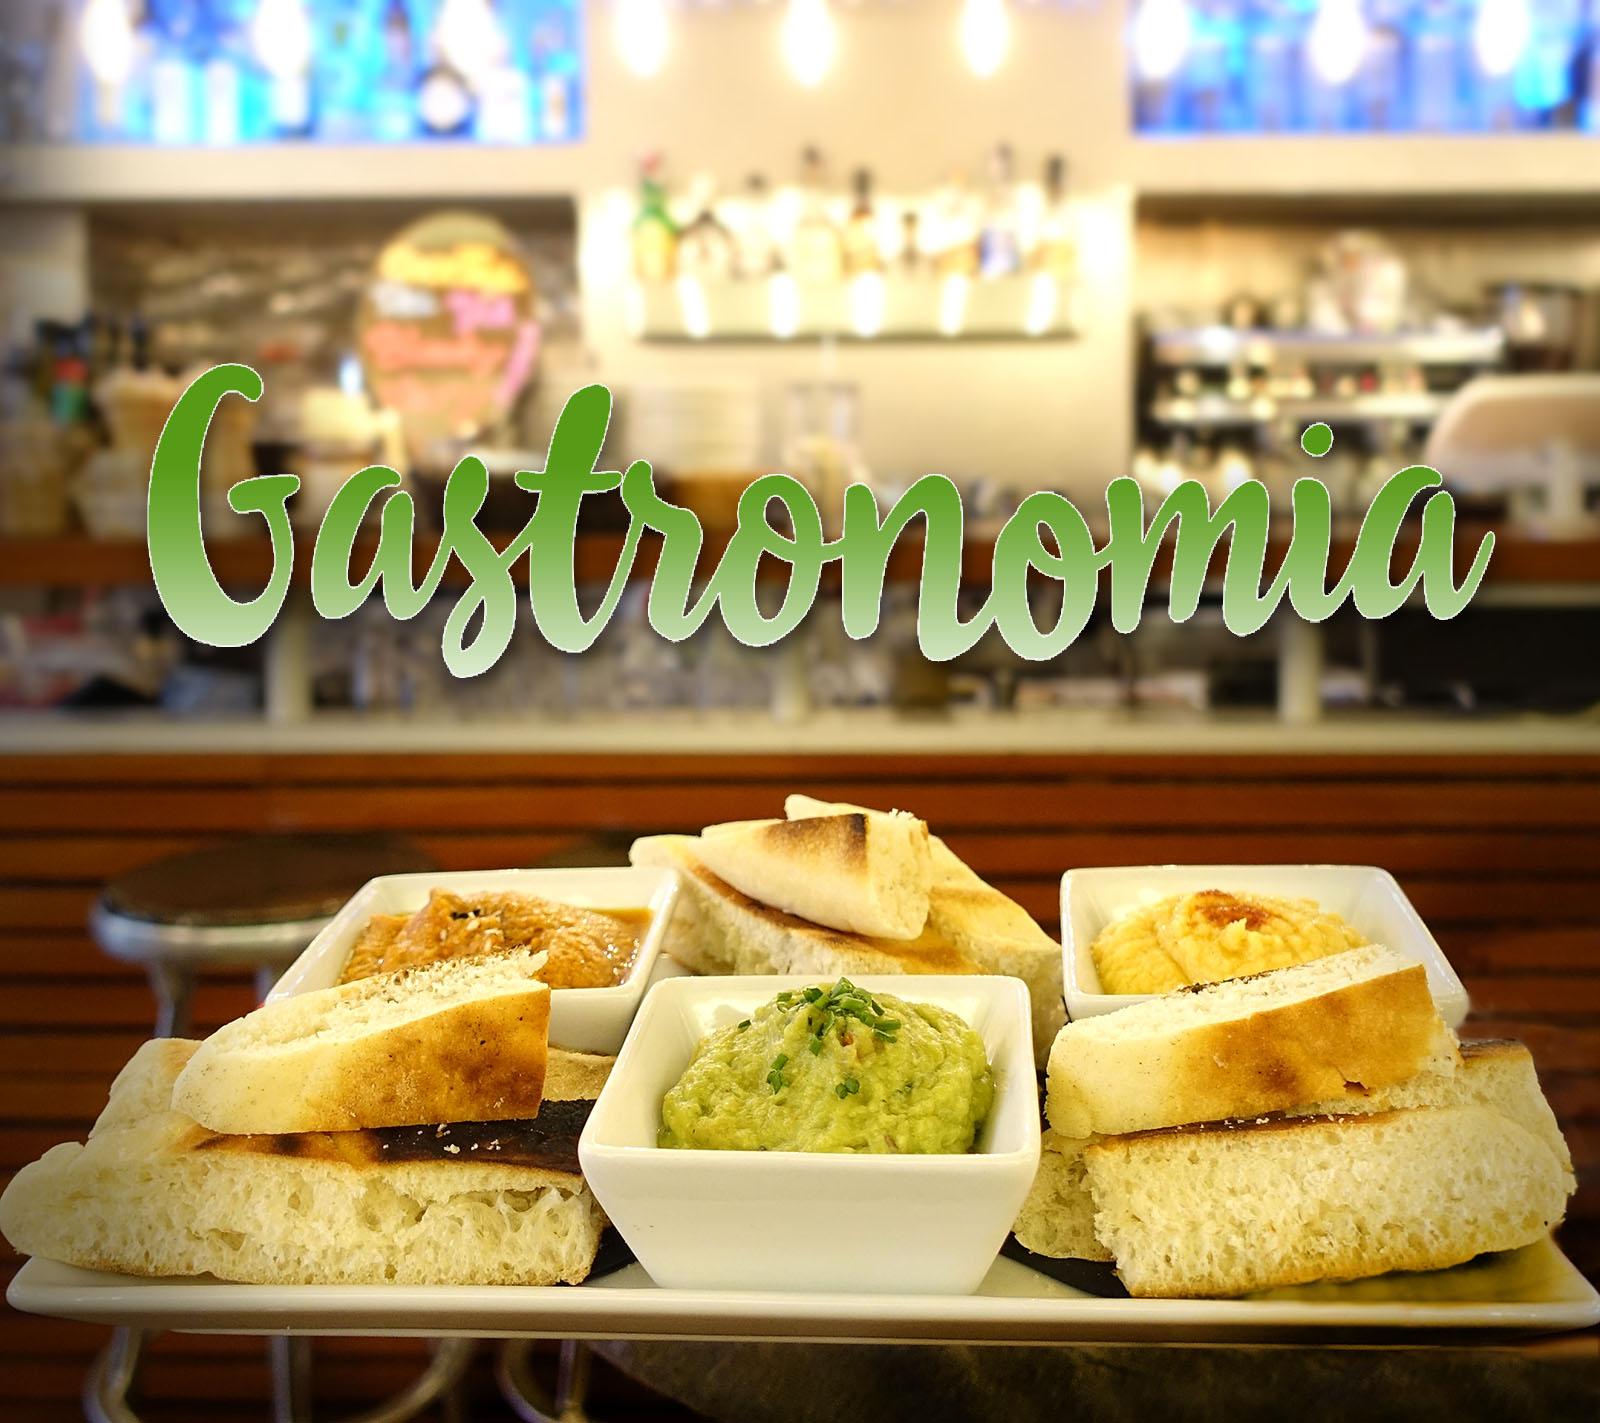 gastronomia bv cat